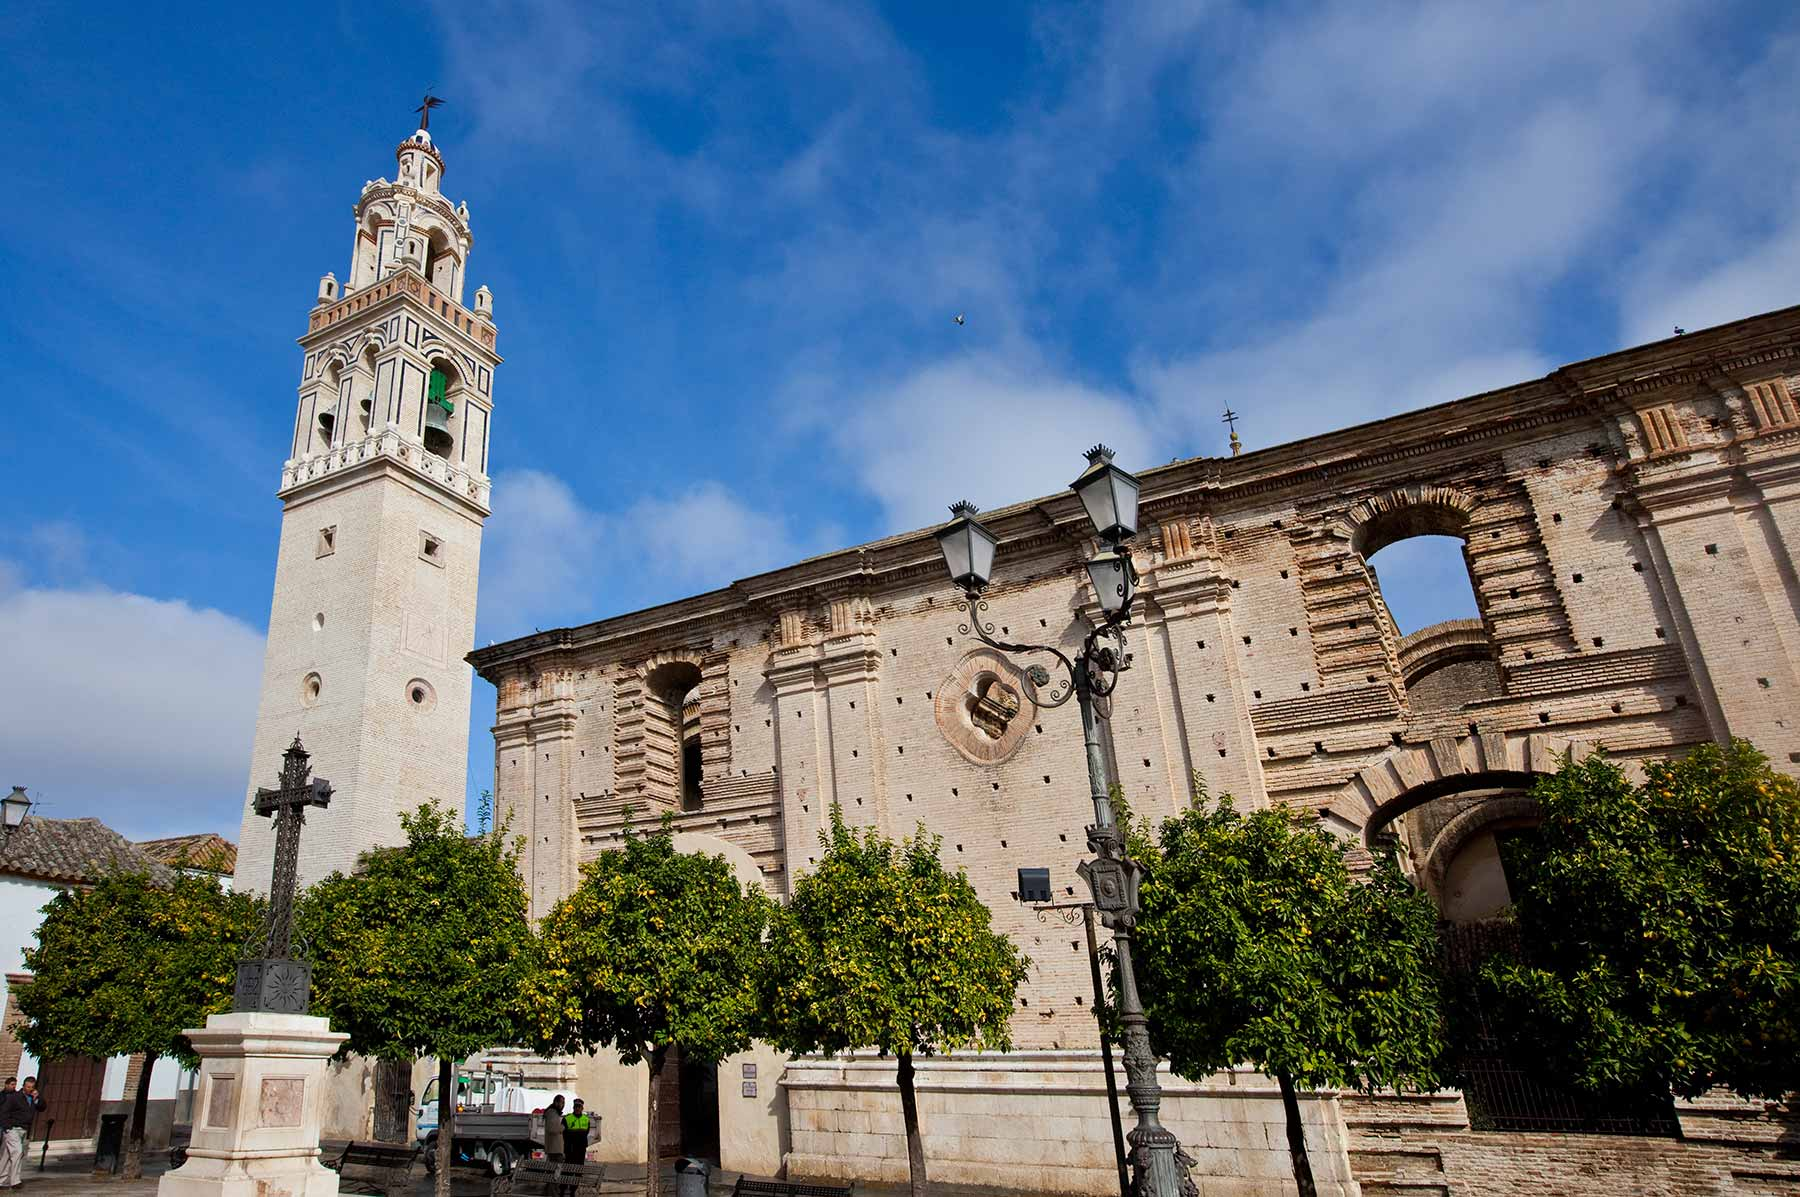 Iglesia de Santa Cruz - Museo de Arte Sacro